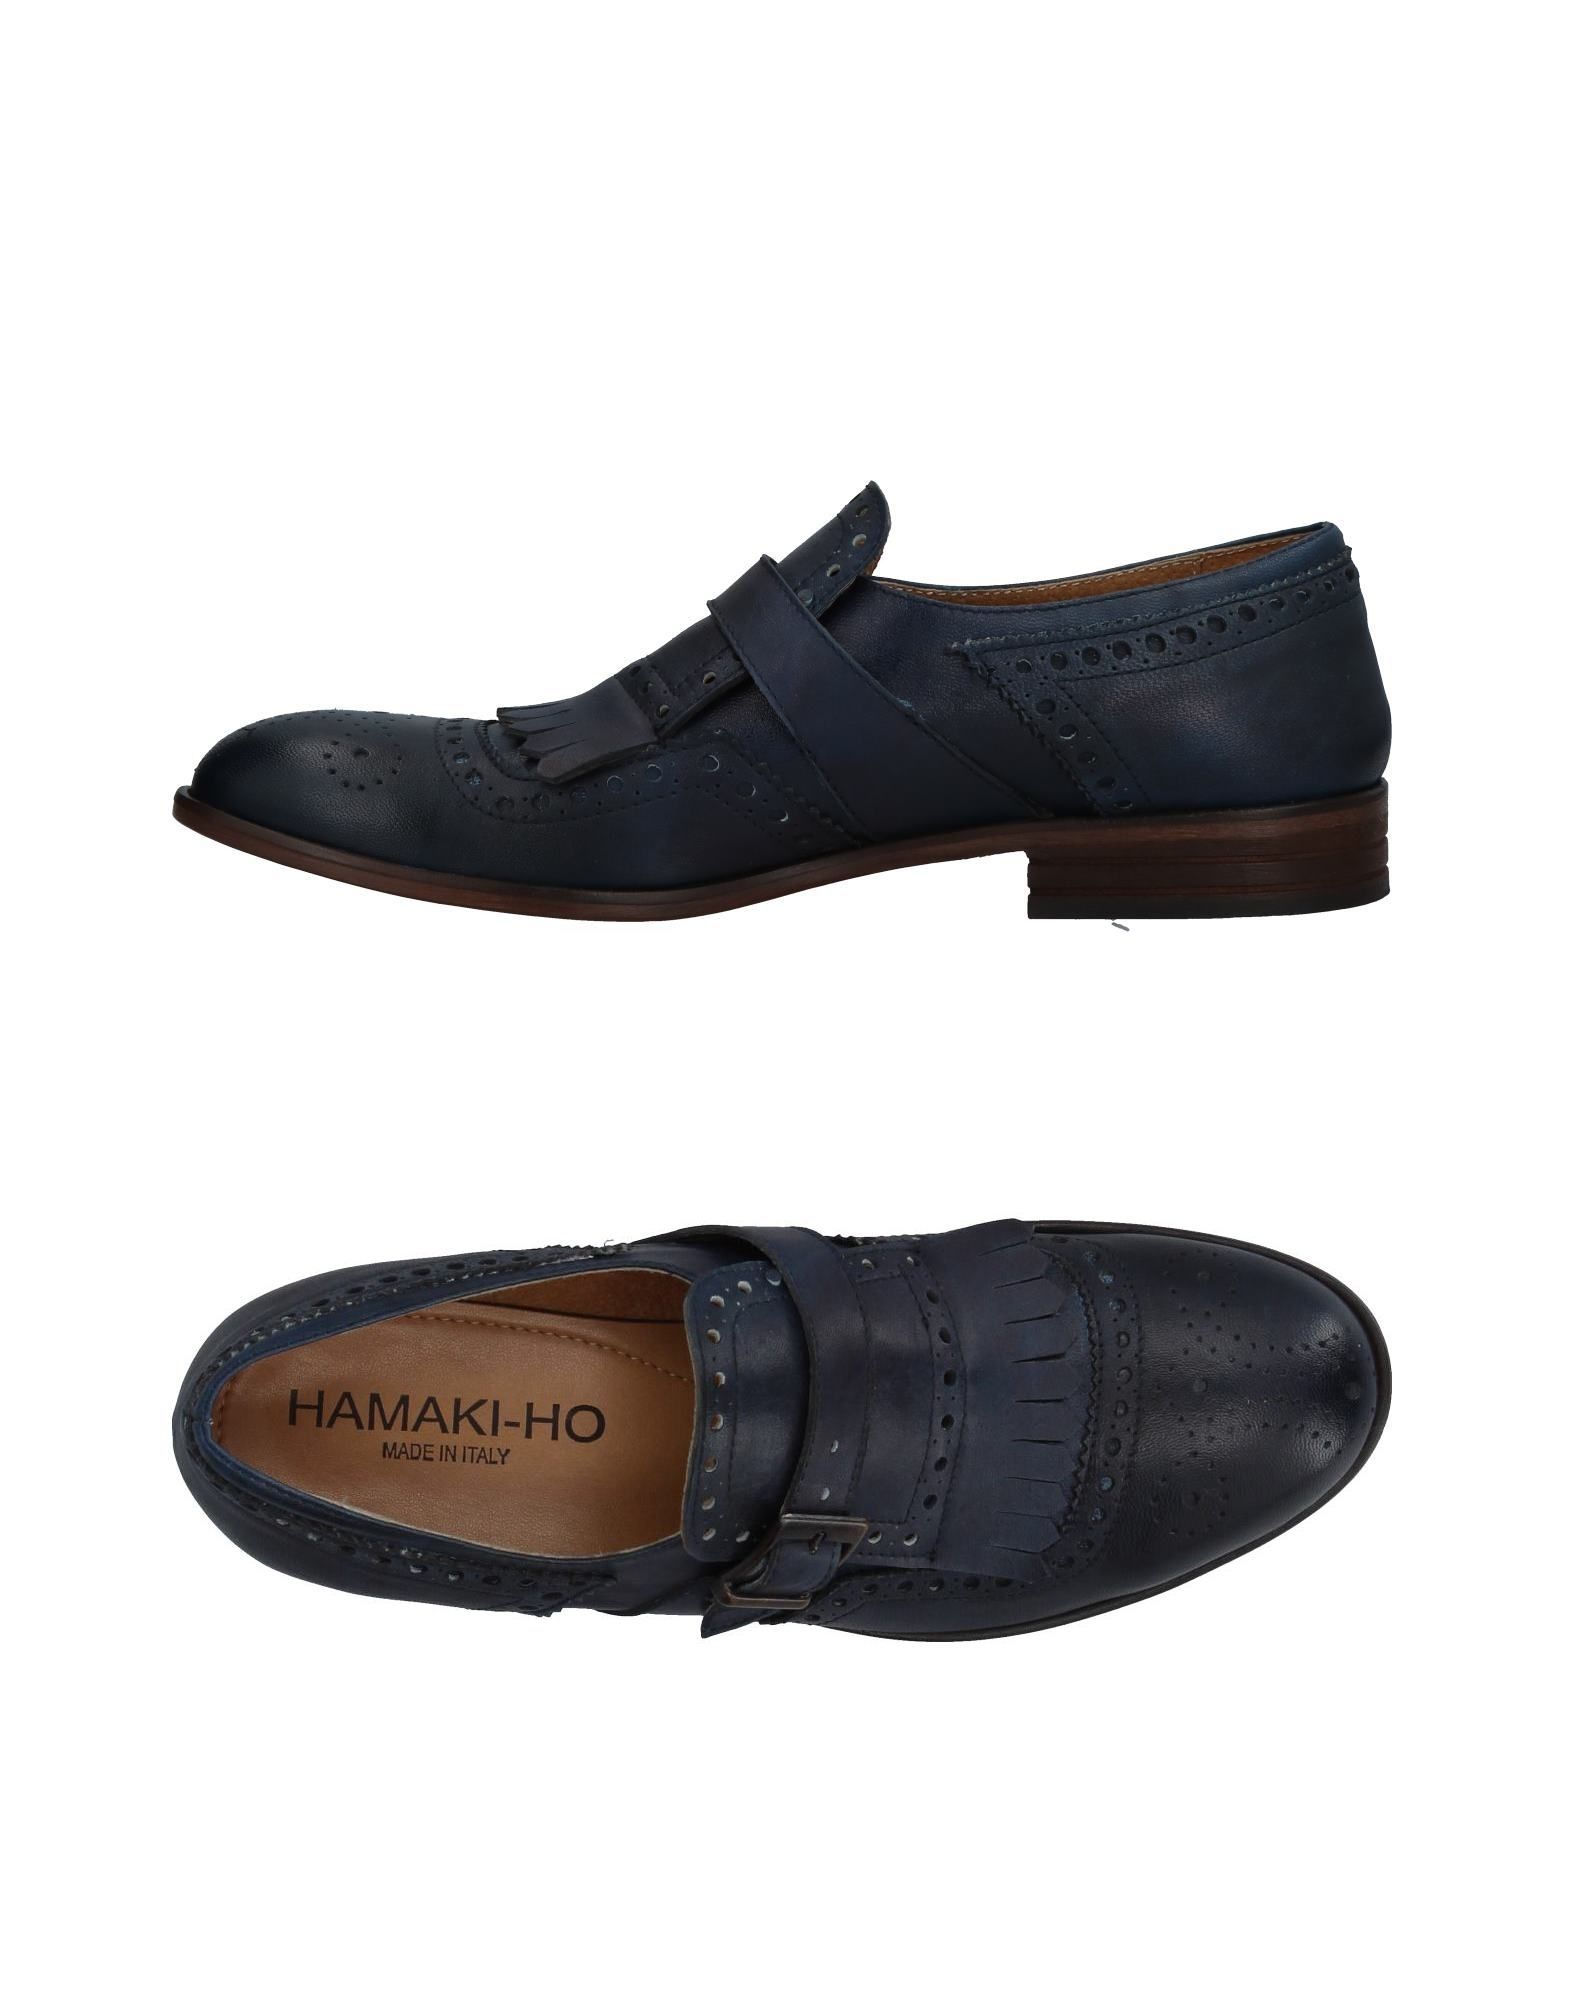 Azul oscuro Mocasín Hamaki-Ho Hombre - Mocasines Mocasines Mocasines Hamaki-Ho Los últimos zapatos de descuento para  hombres  y mujeres b6e71d